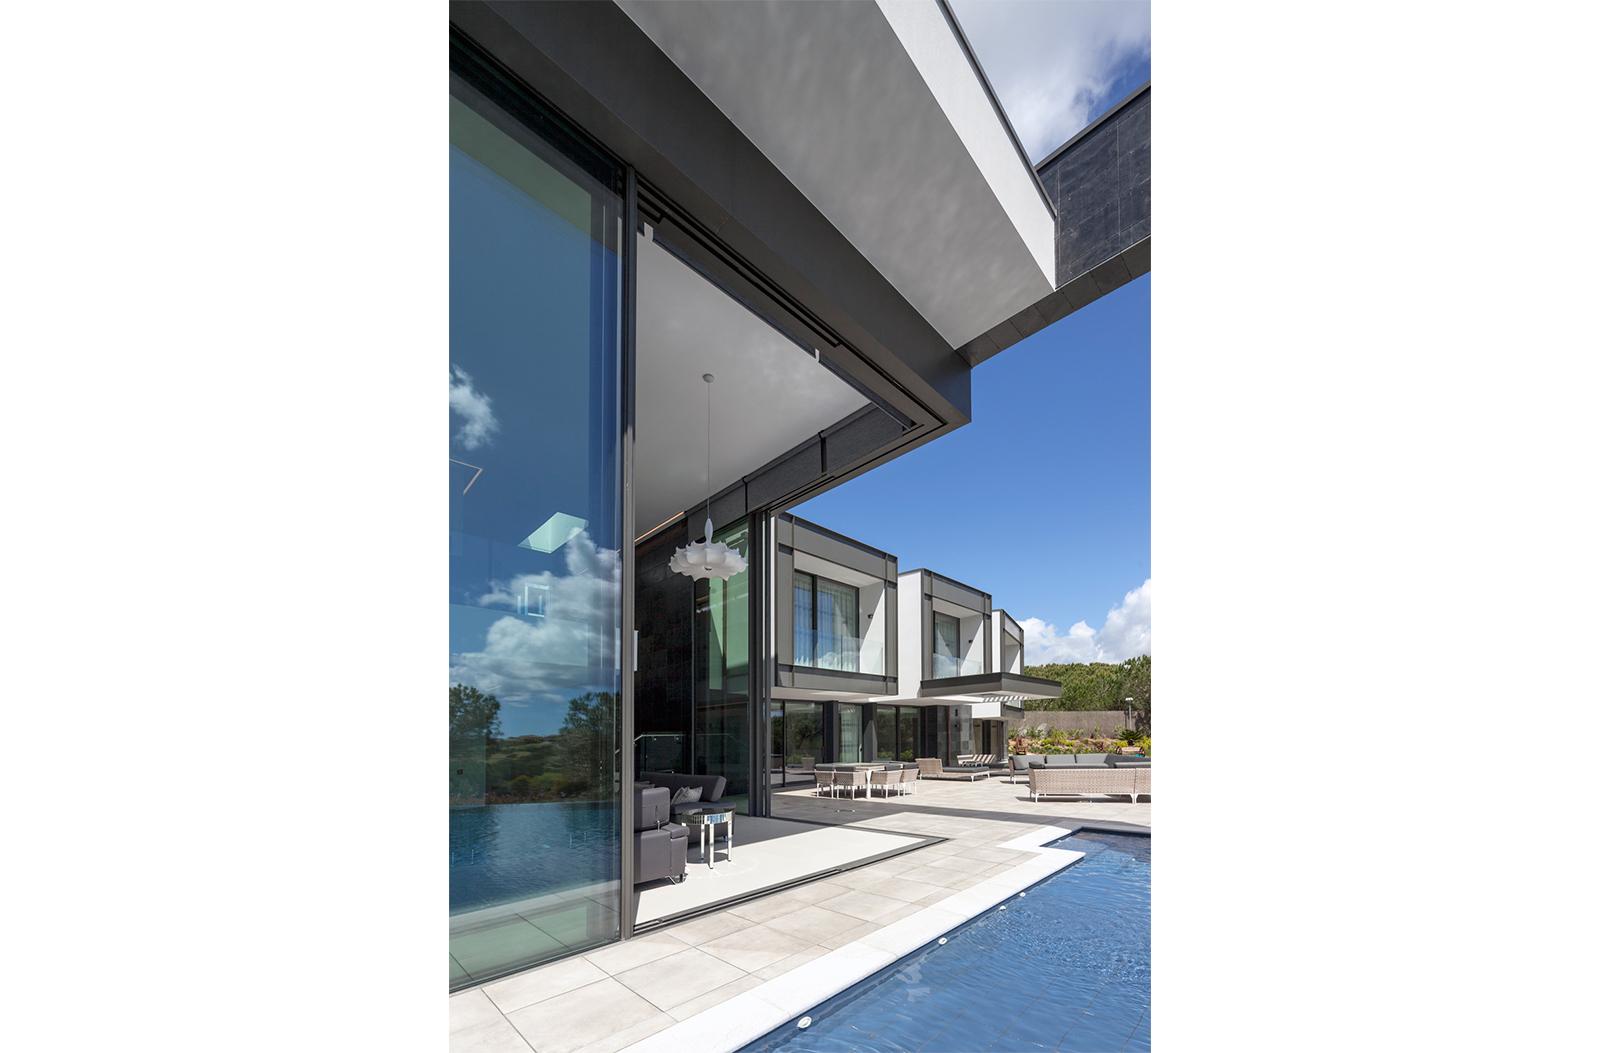 Villa-Kearney-Residential-Project-Architect-Spain-3